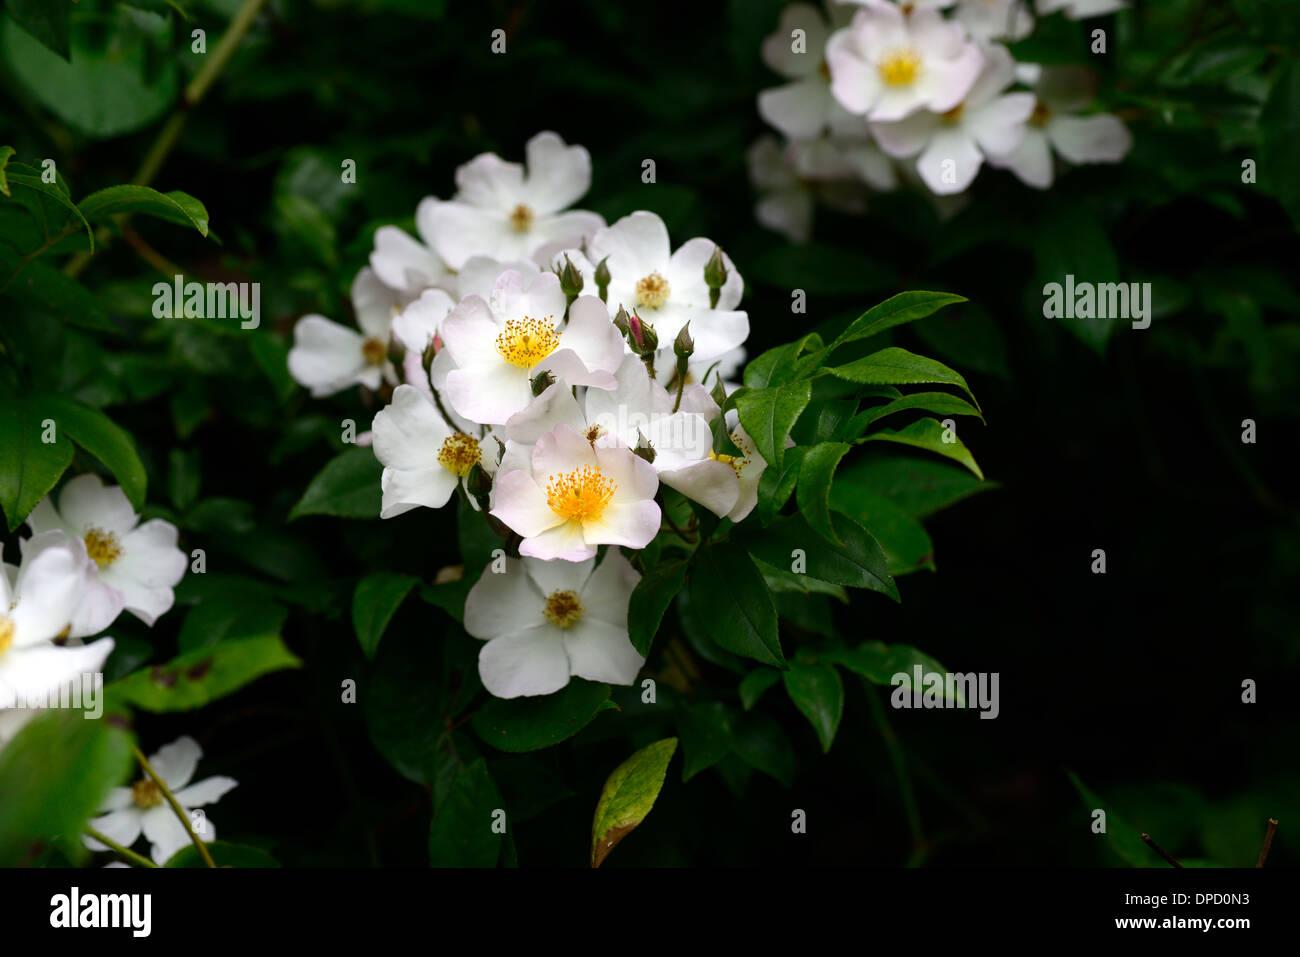 rosa wedding day white rose rambler rambling climbers climbing flowering flowers roses walls growing on stone wall - Stock Image